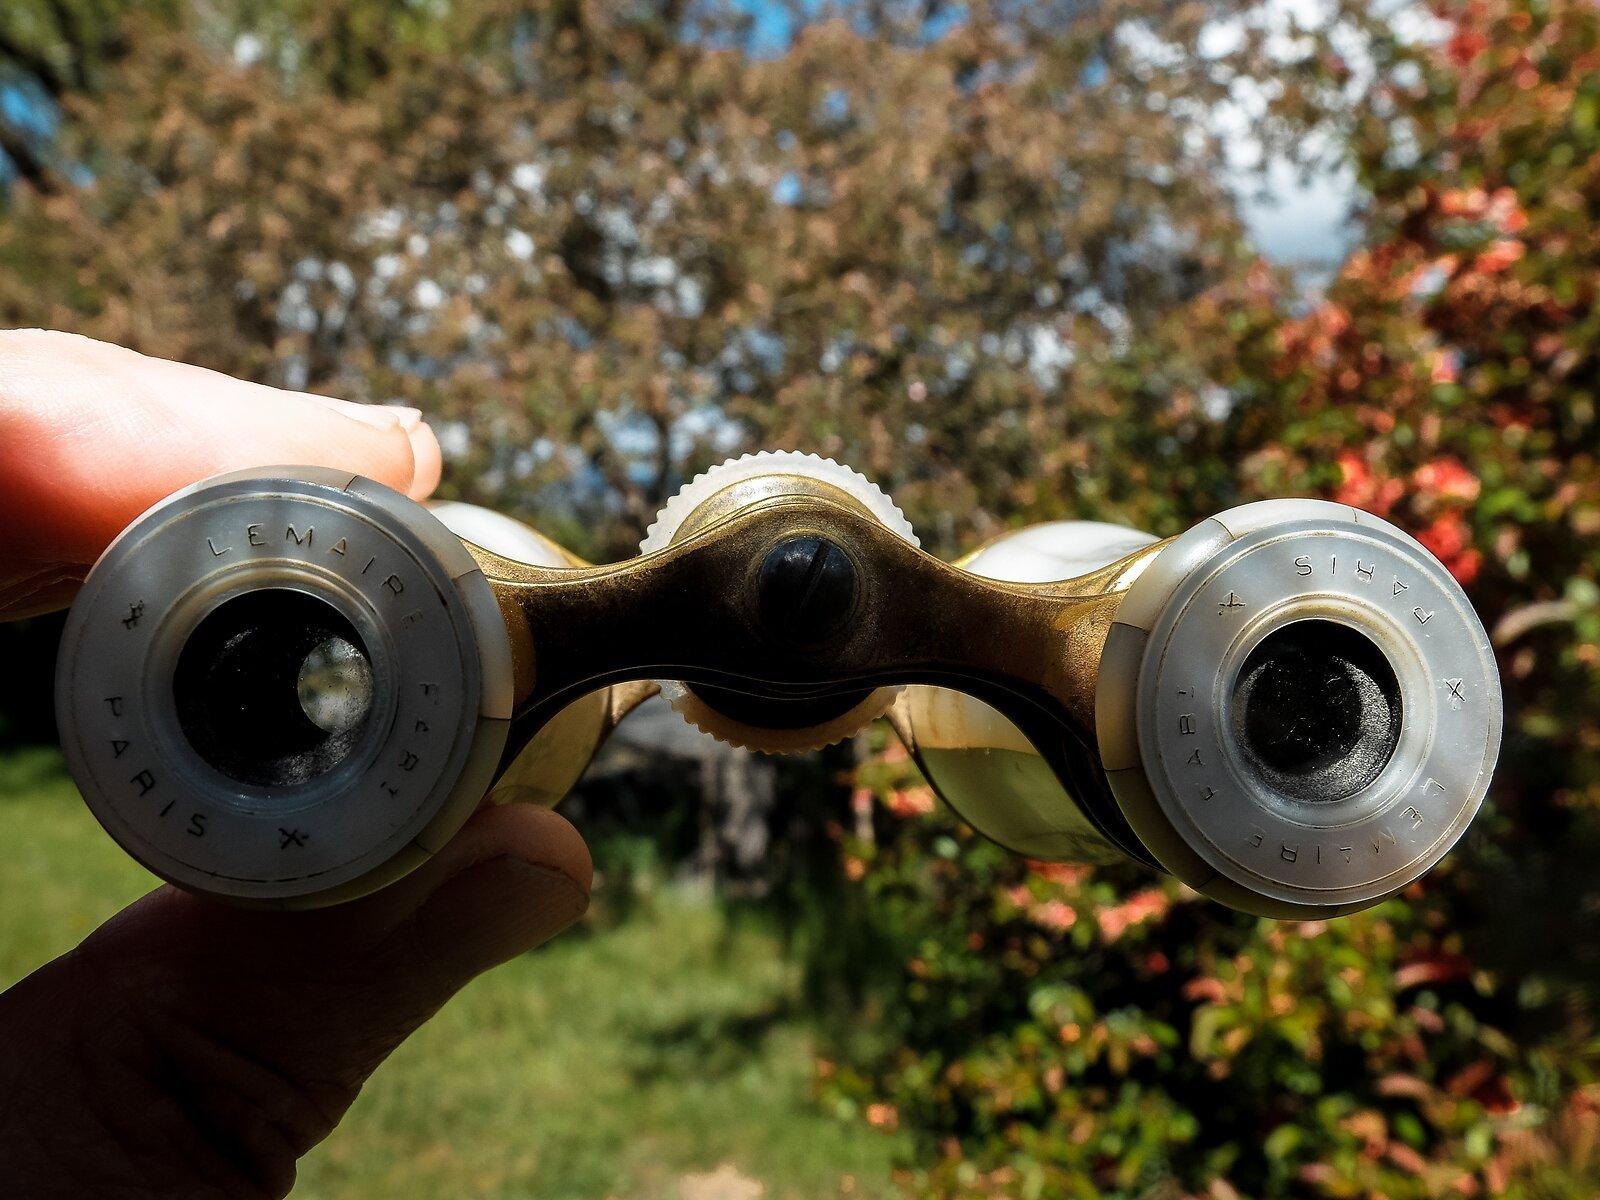 X30_Apr26_21_Opera_glasses(color).jpg